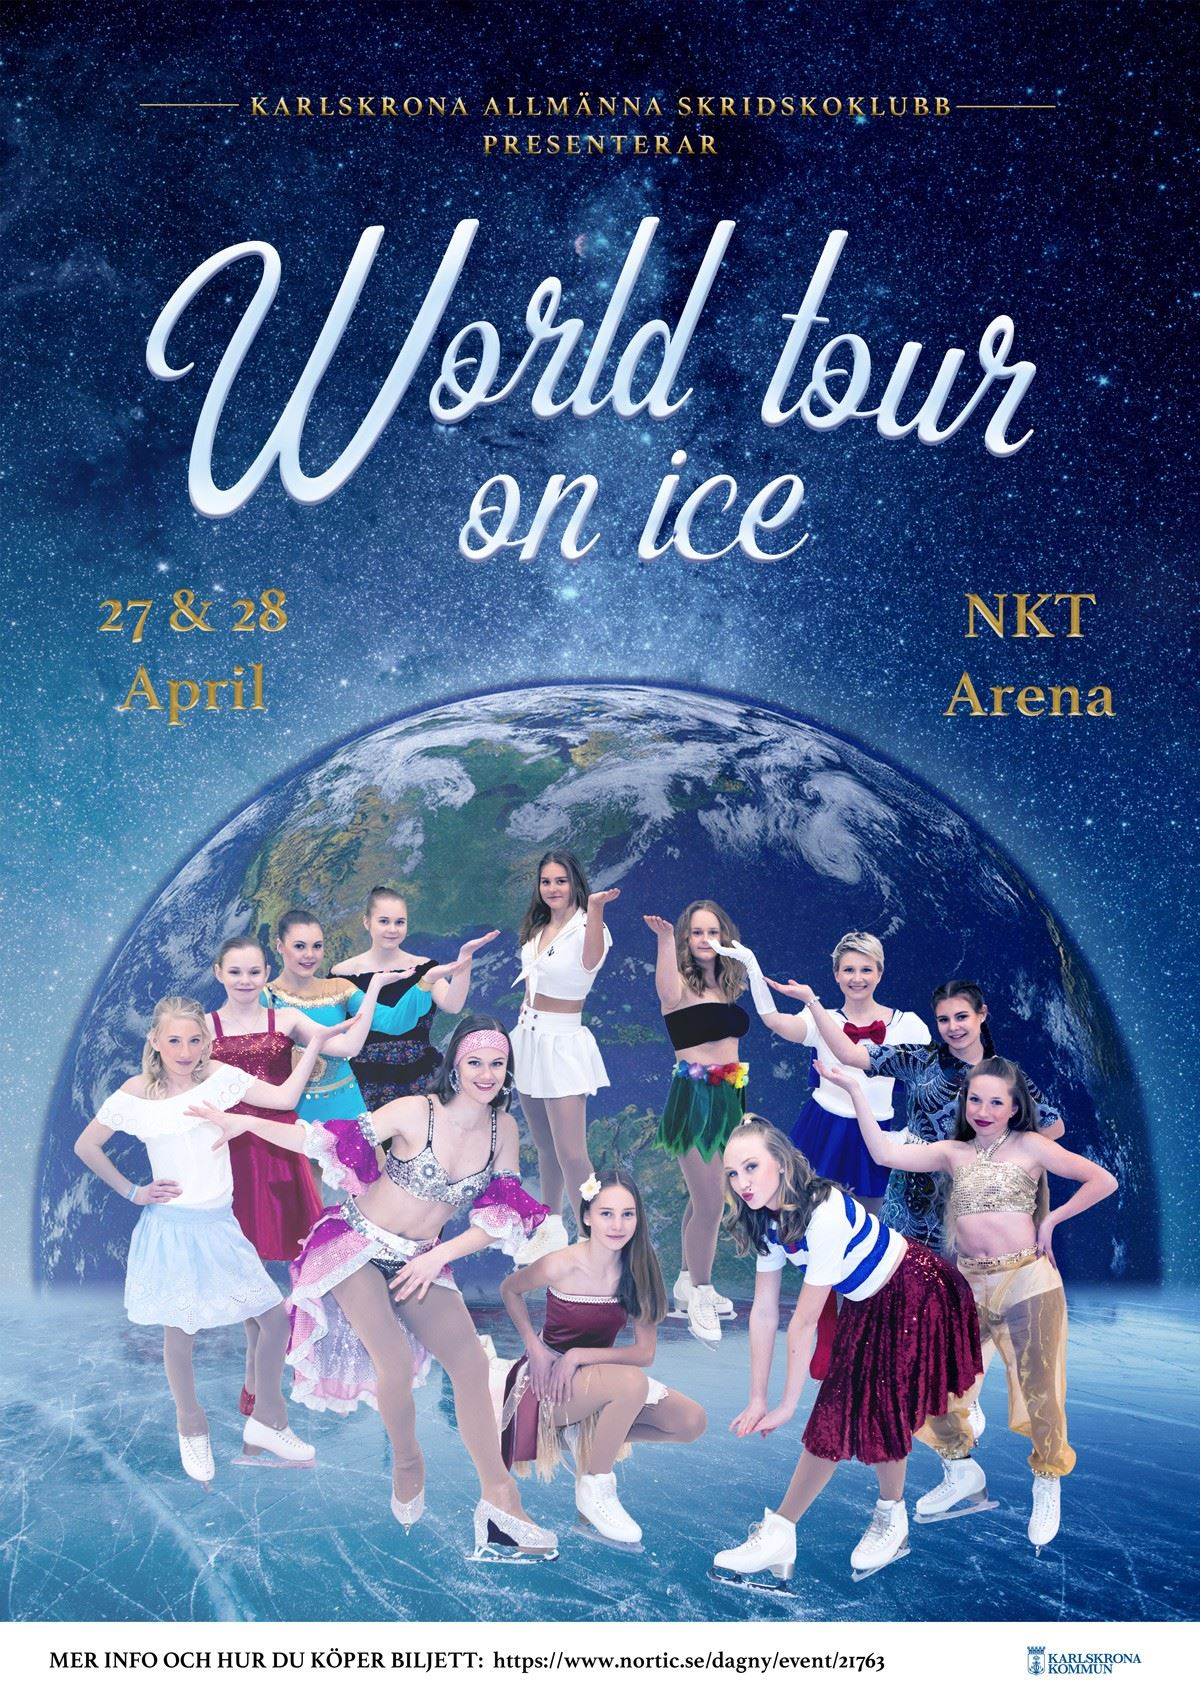 World tour on ice - Karlskrona Allmänna Skridskoklubb